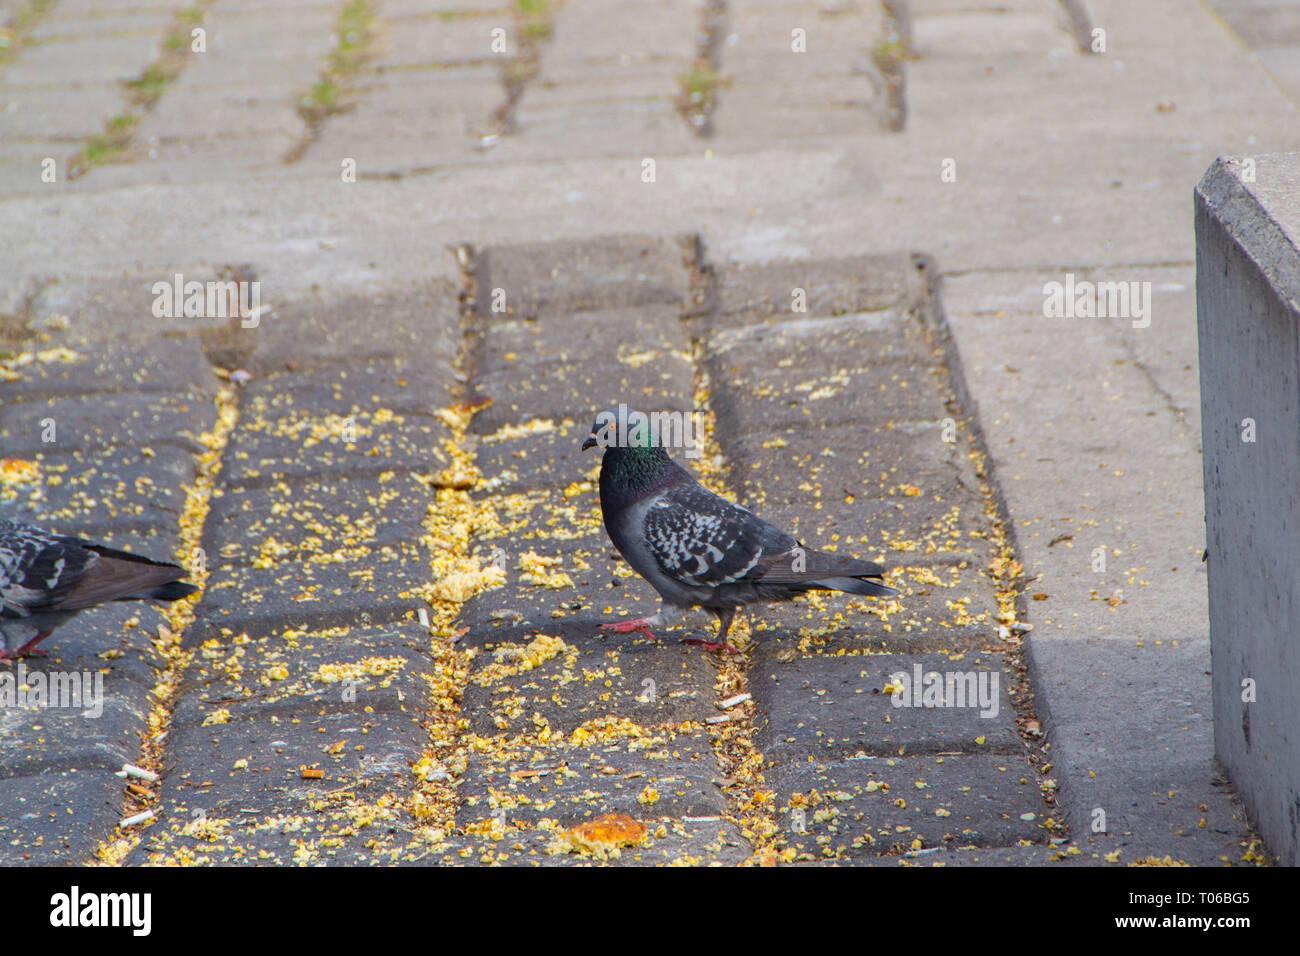 The Wild City Pigeons feed on the promenade along the Danube River in Novi Sad, Serbia Stock Photo